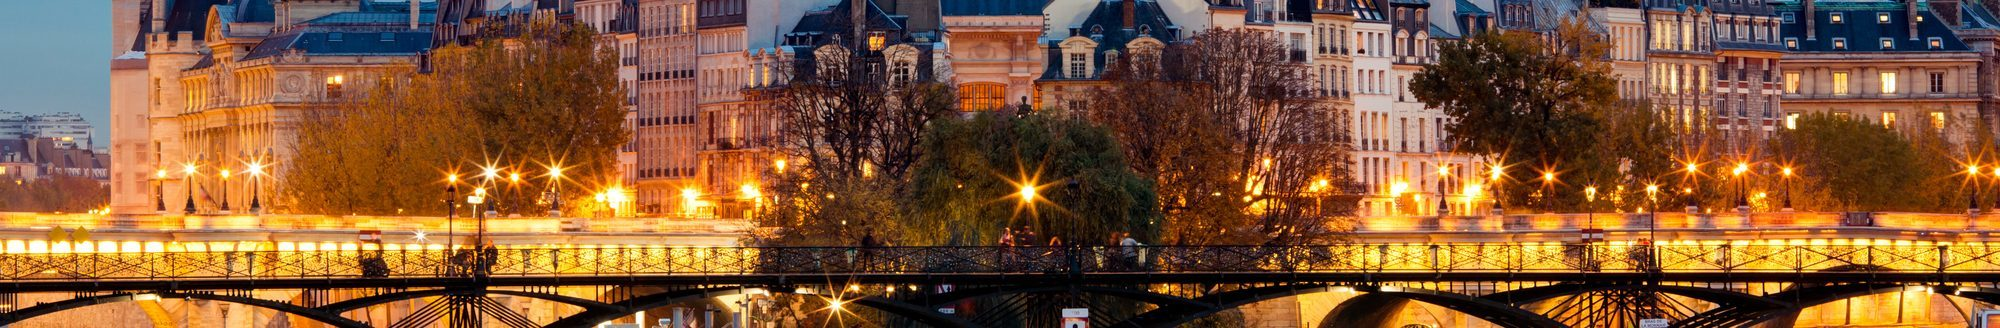 History of the bridges of Paris